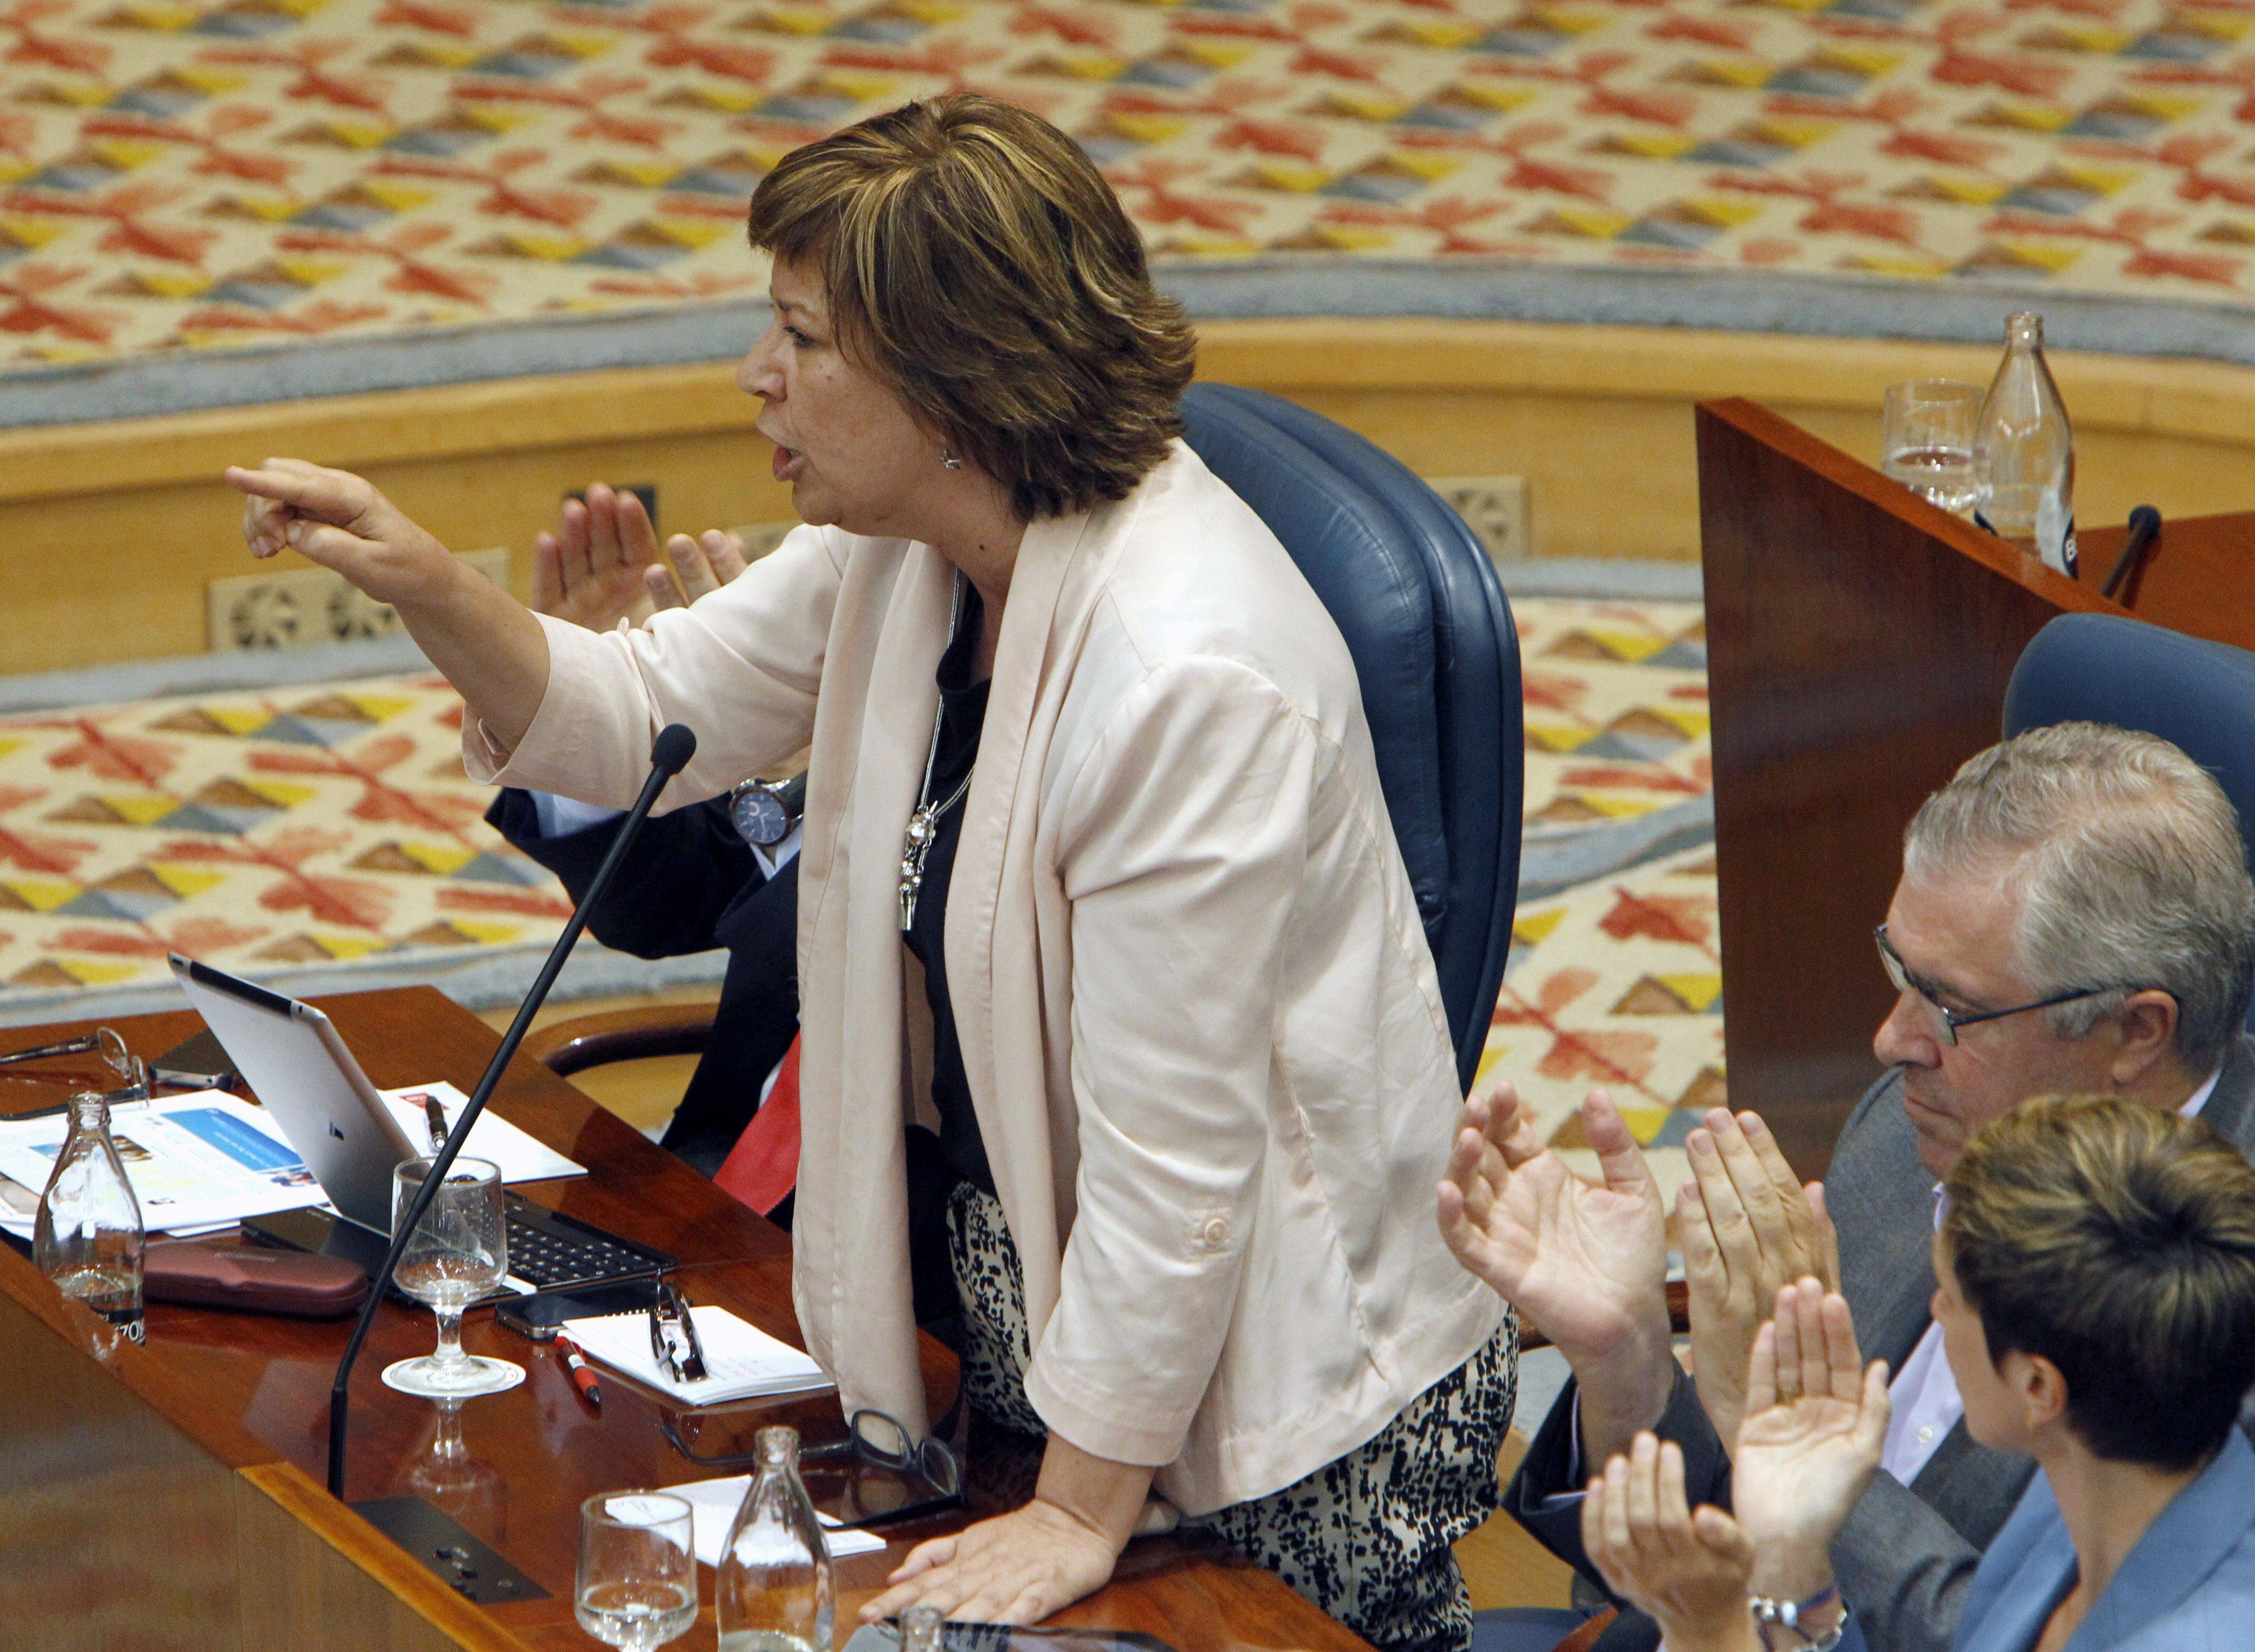 El PP presenta mañana una querella contra Menéndez por llamar «corrupto» a González